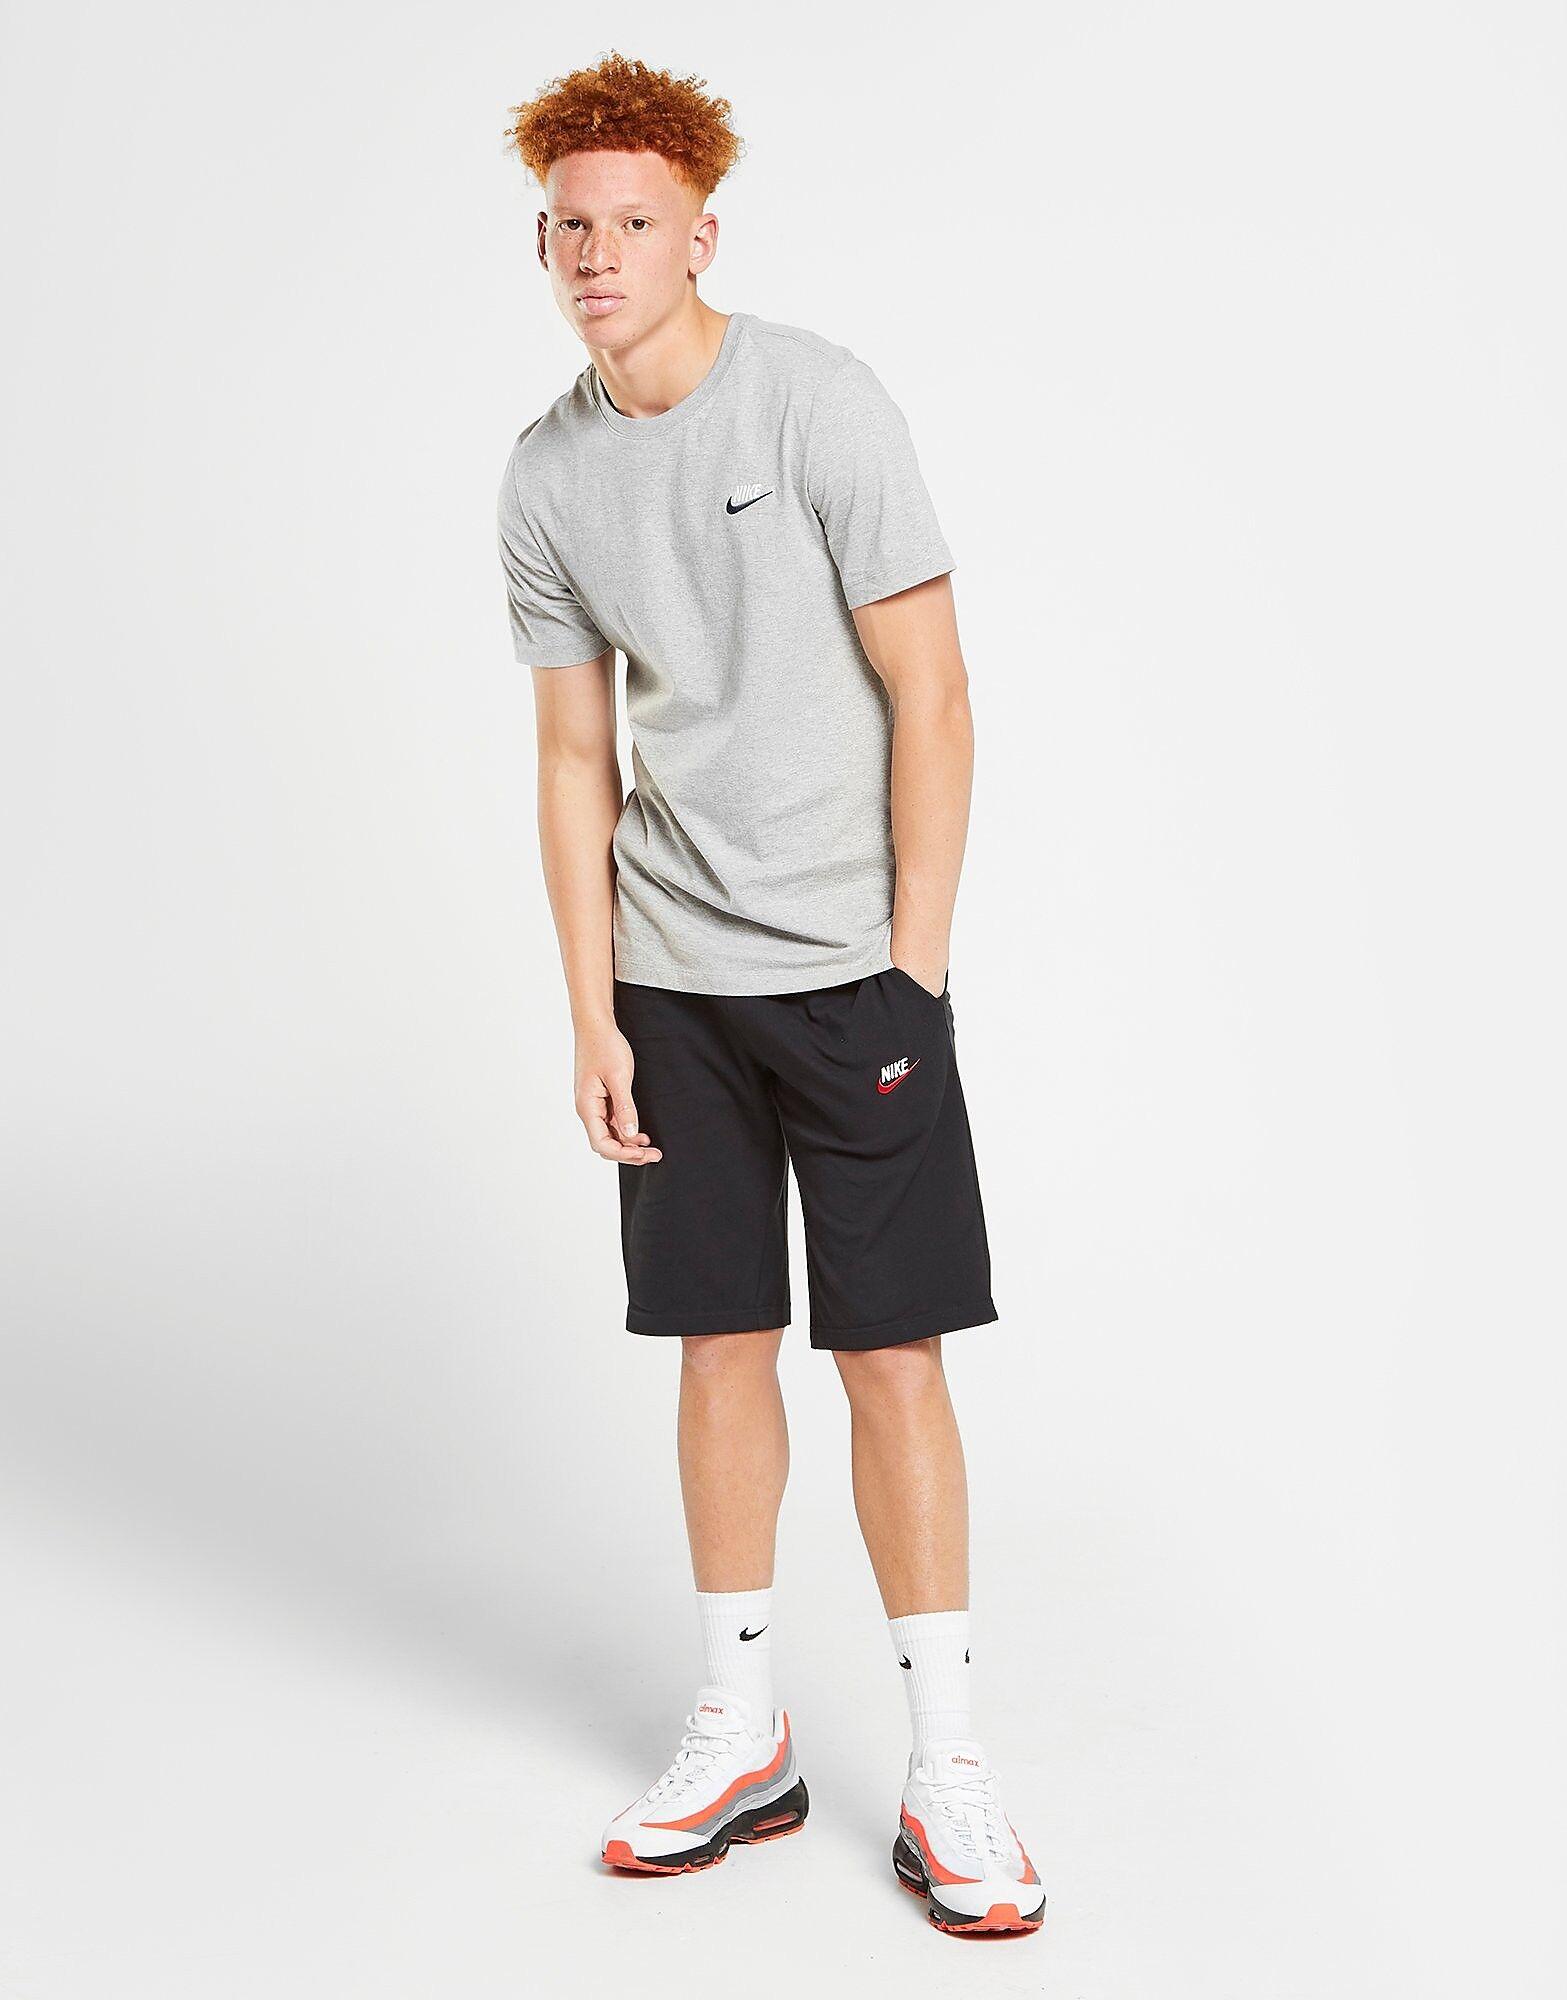 Image of Nike Foundation Jersey Shortsit Miehet - Only at JD - Mens, Musta